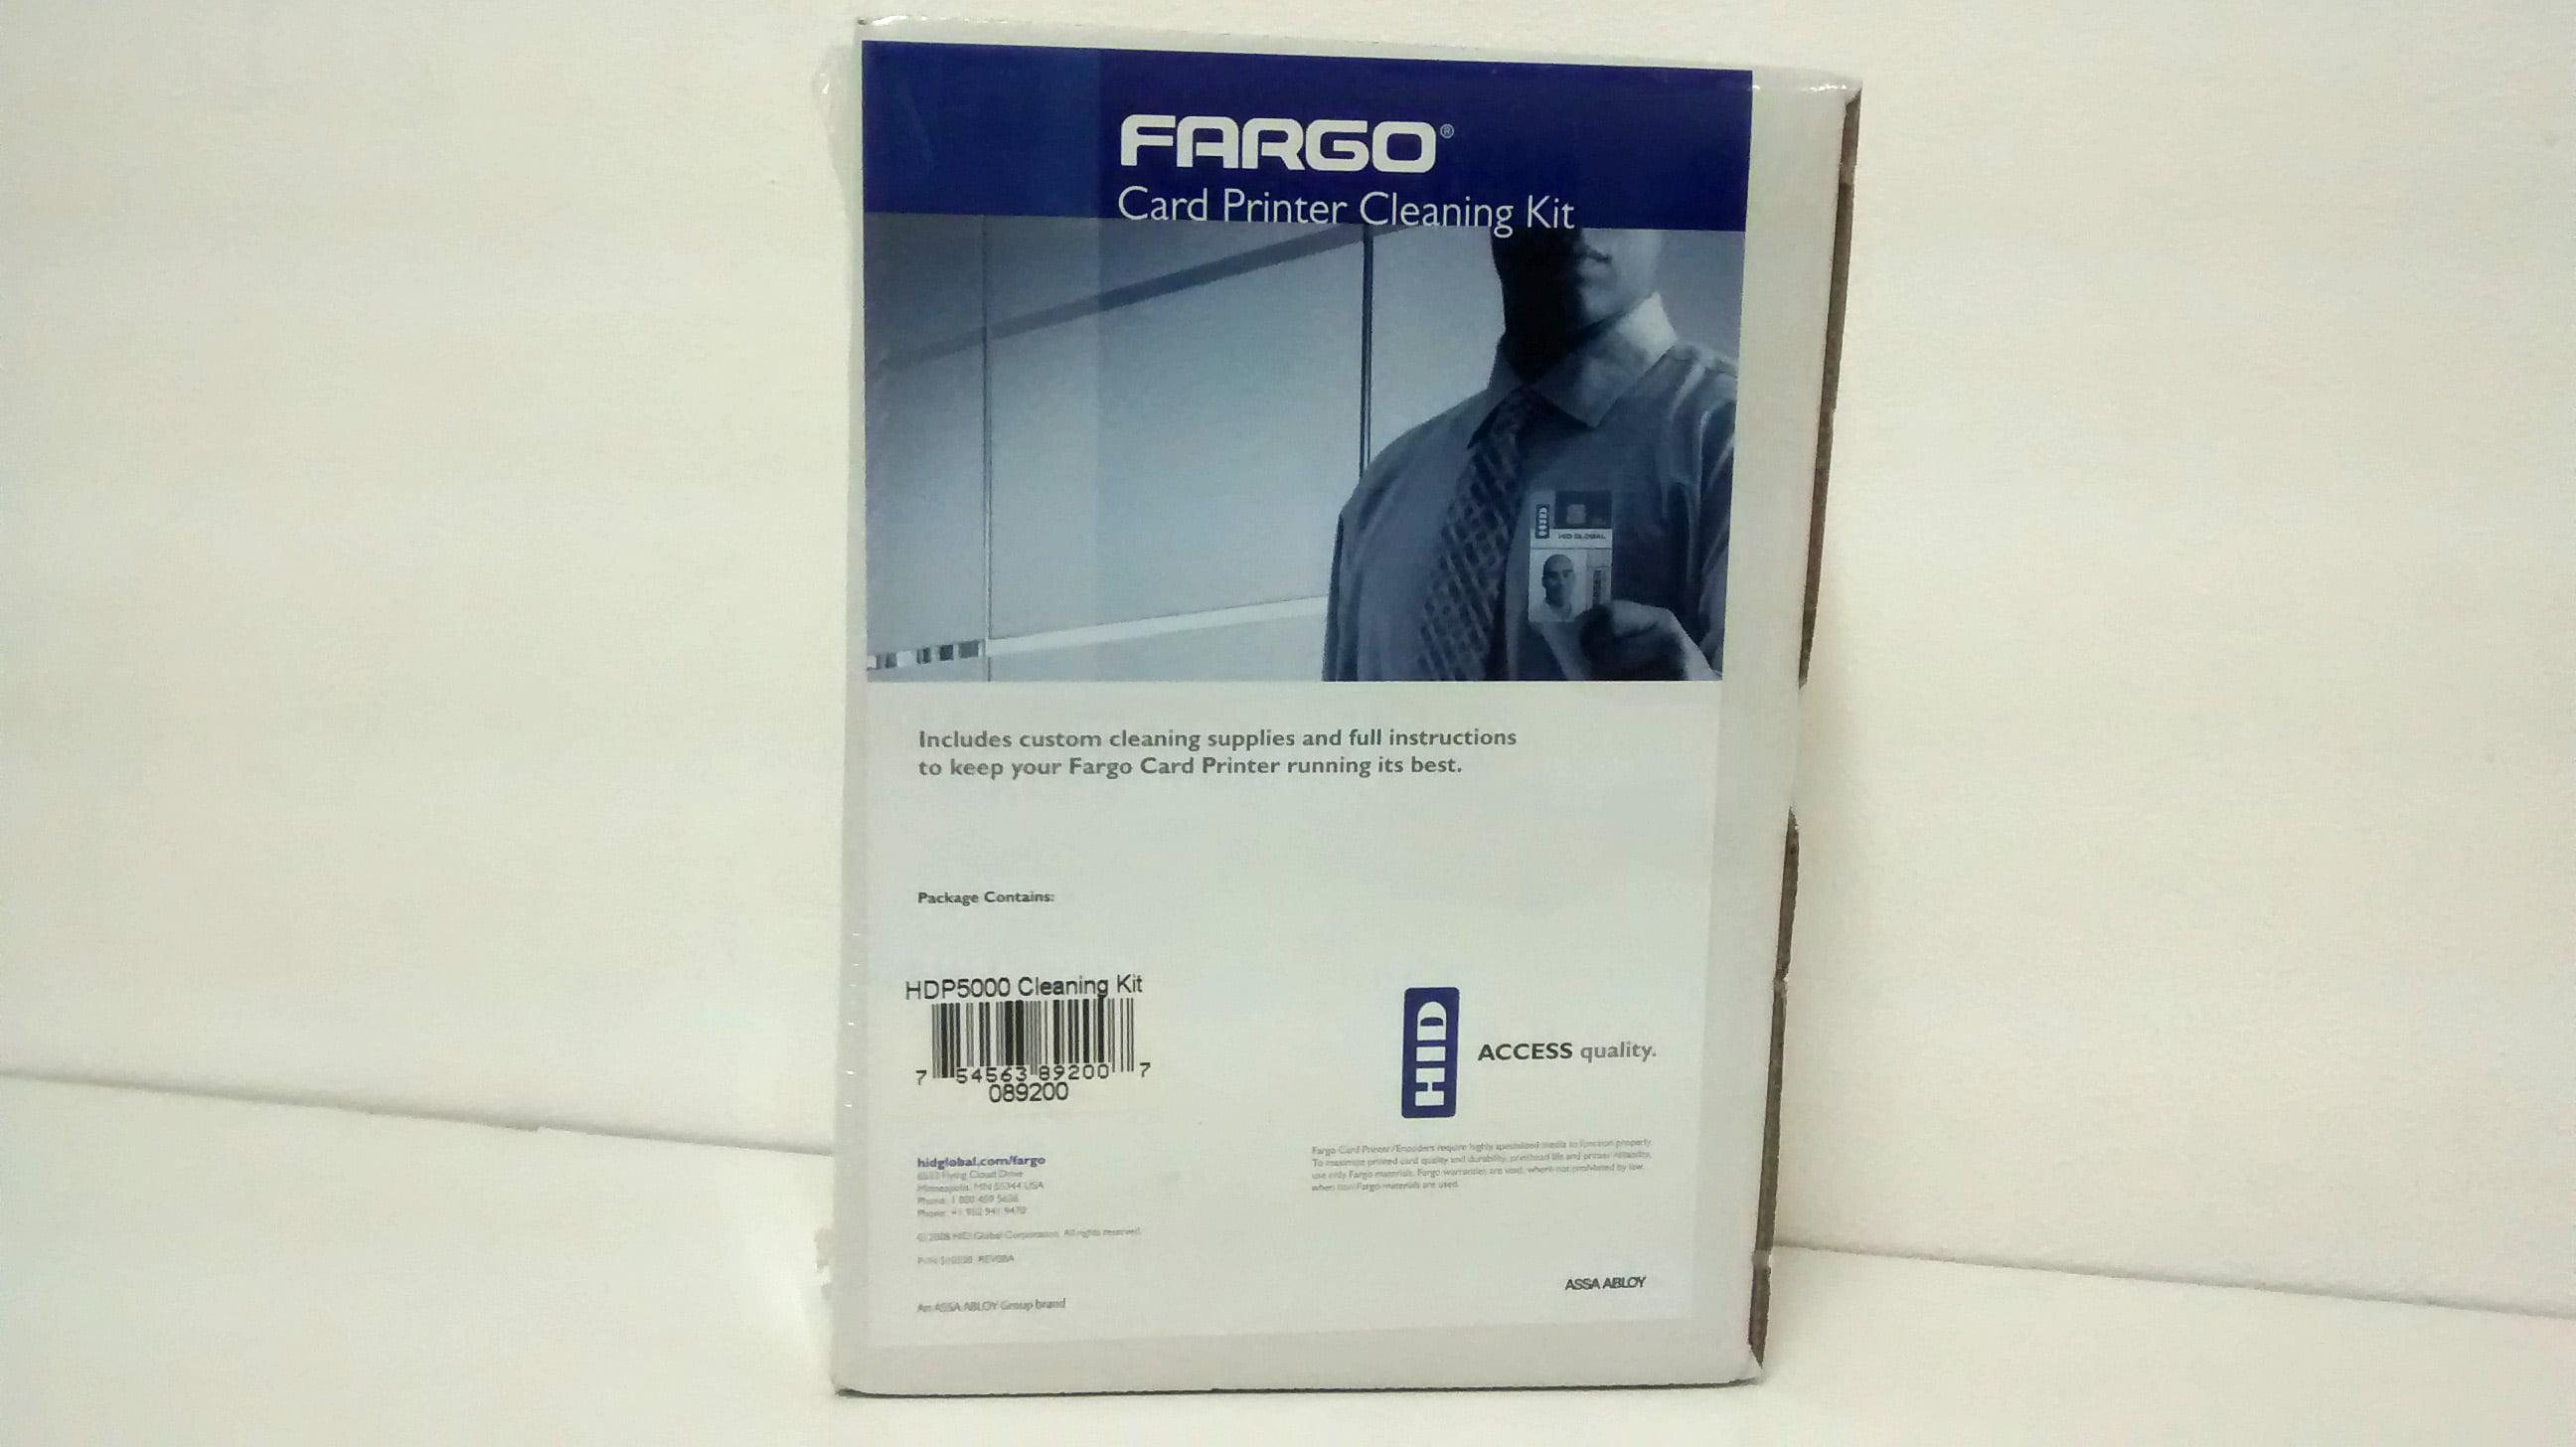 Kit de Limpeza Fargo 89200 - 4 cotonetes, 10 cartões tape, 10 lenços, 3 cartões HDP5000